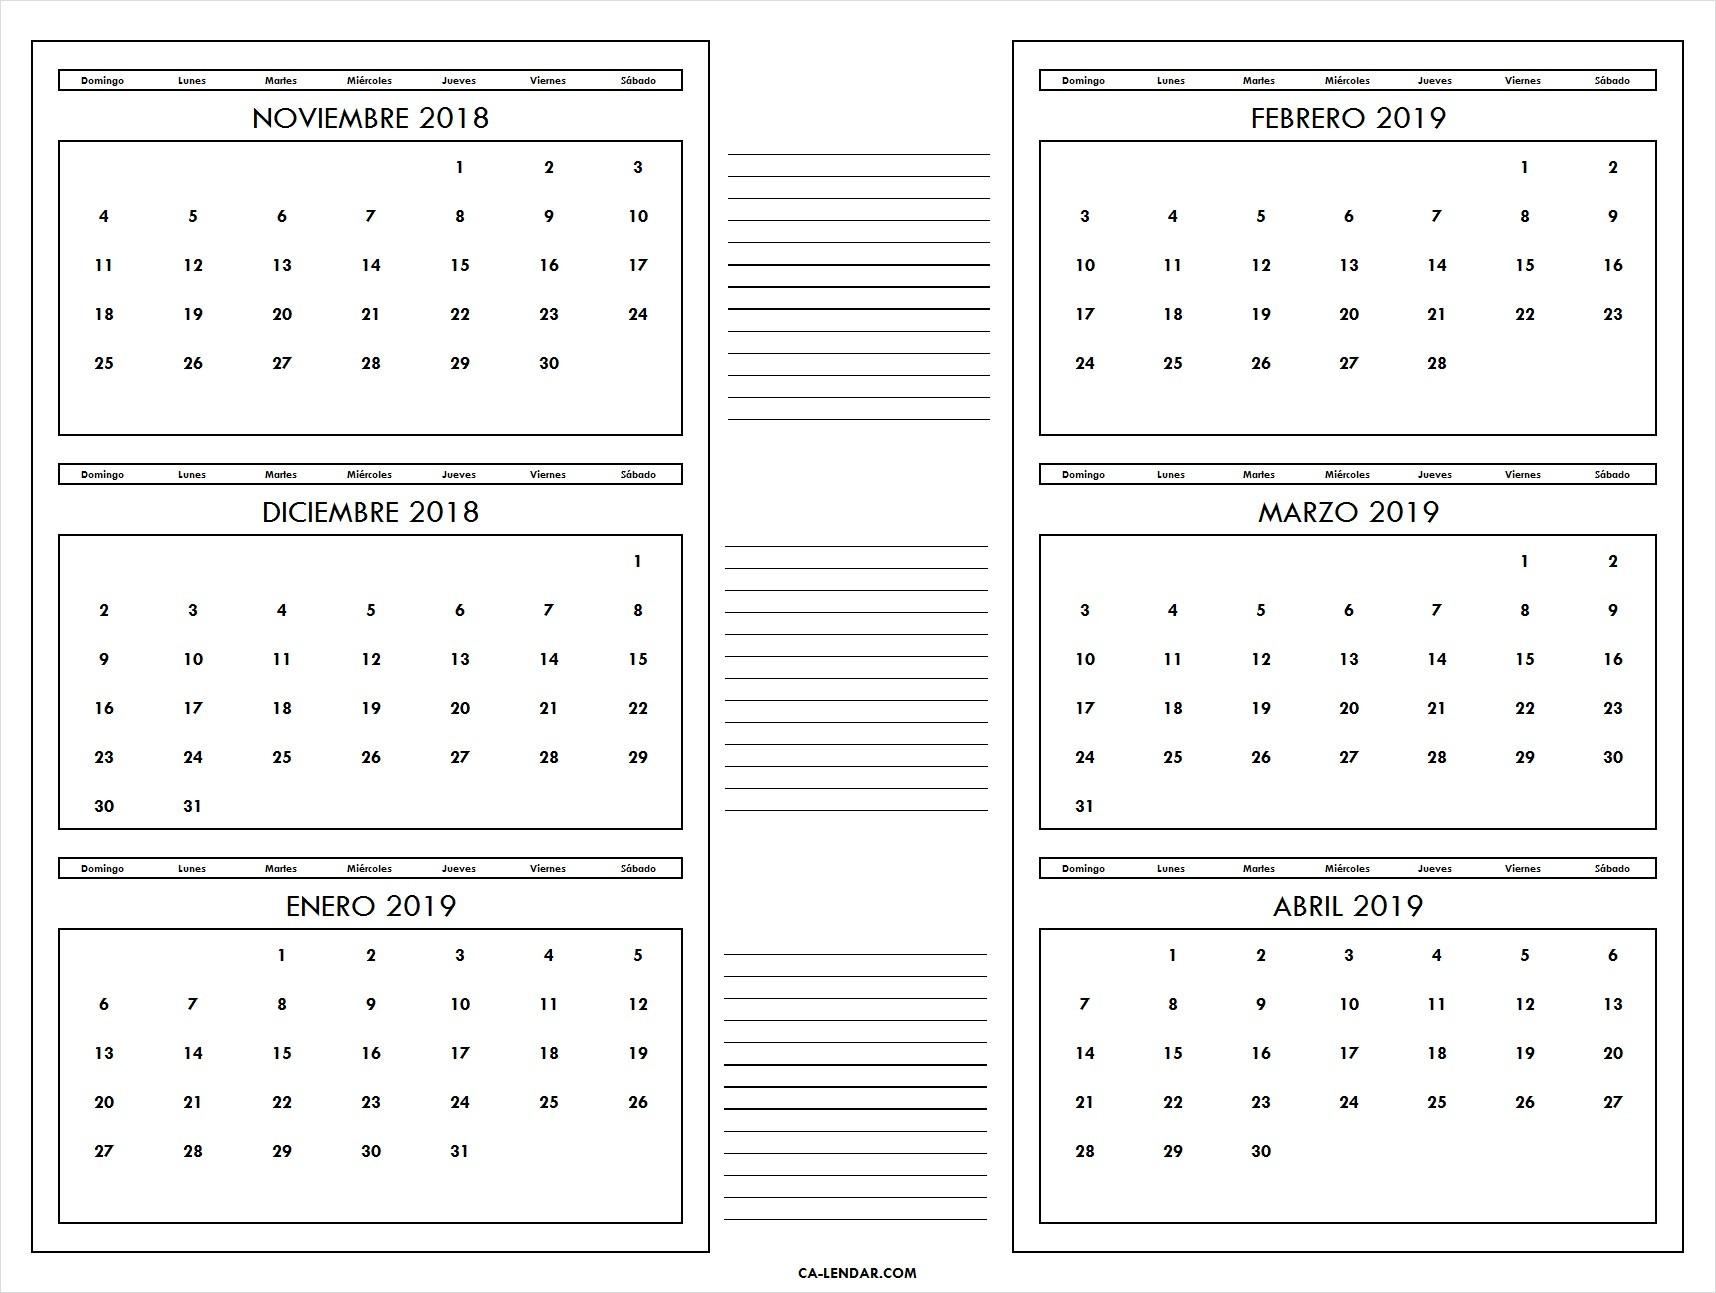 Calendario Noviembre 2018 a Abril 2019 Domingo a Lunes